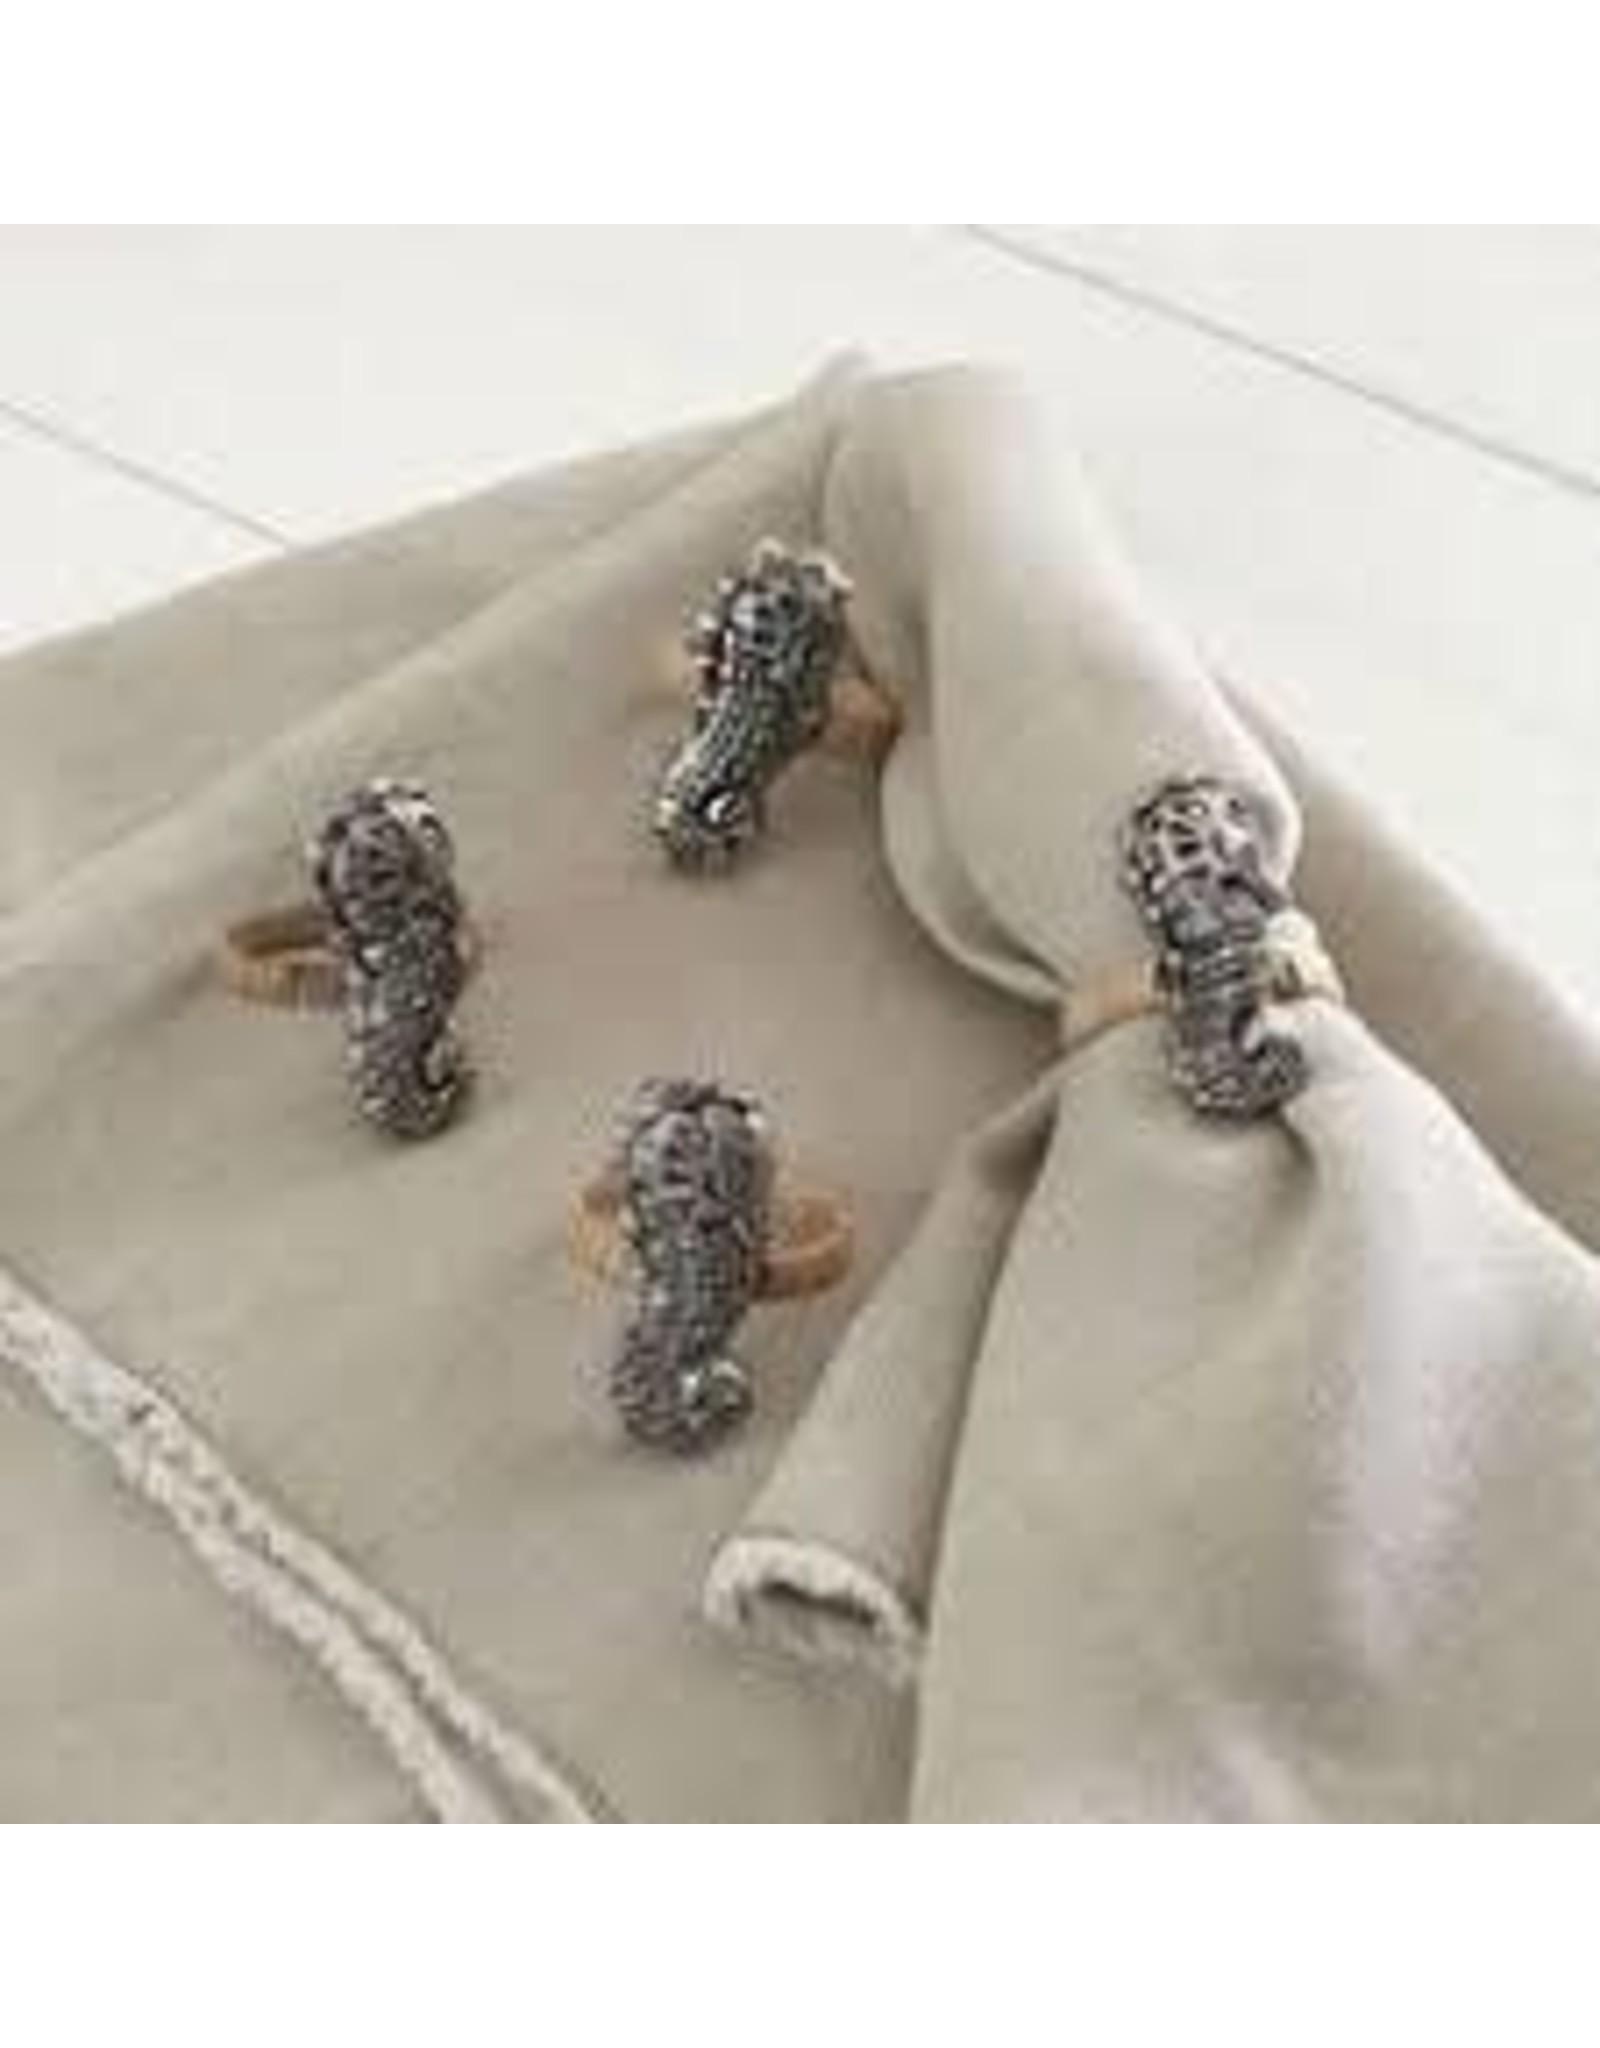 Design Imports DI-Seahorse Napkin Ring